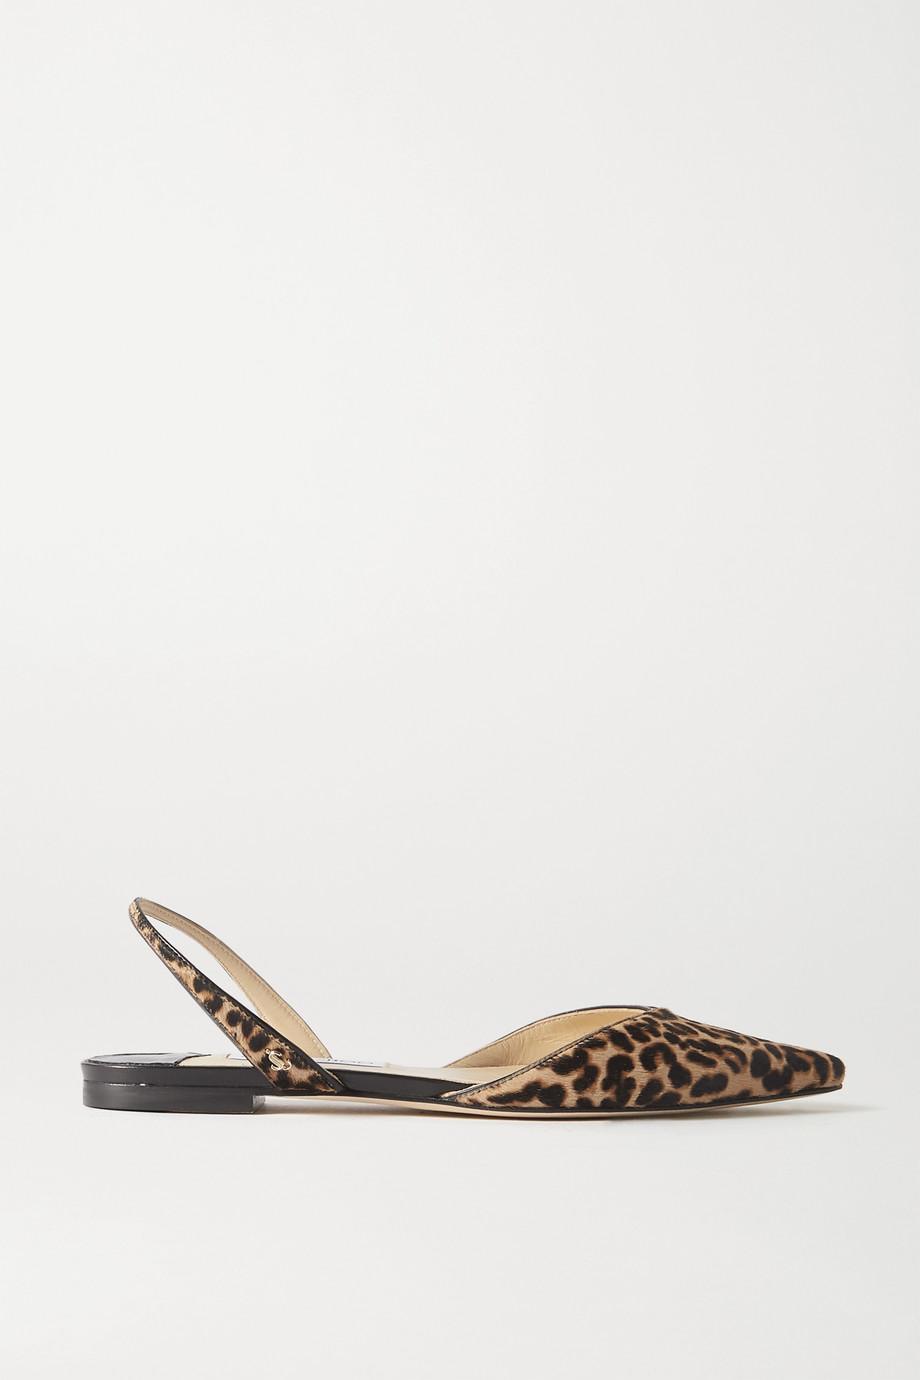 Jimmy Choo Thandi leopard-print calf hair slingback point-toe flats